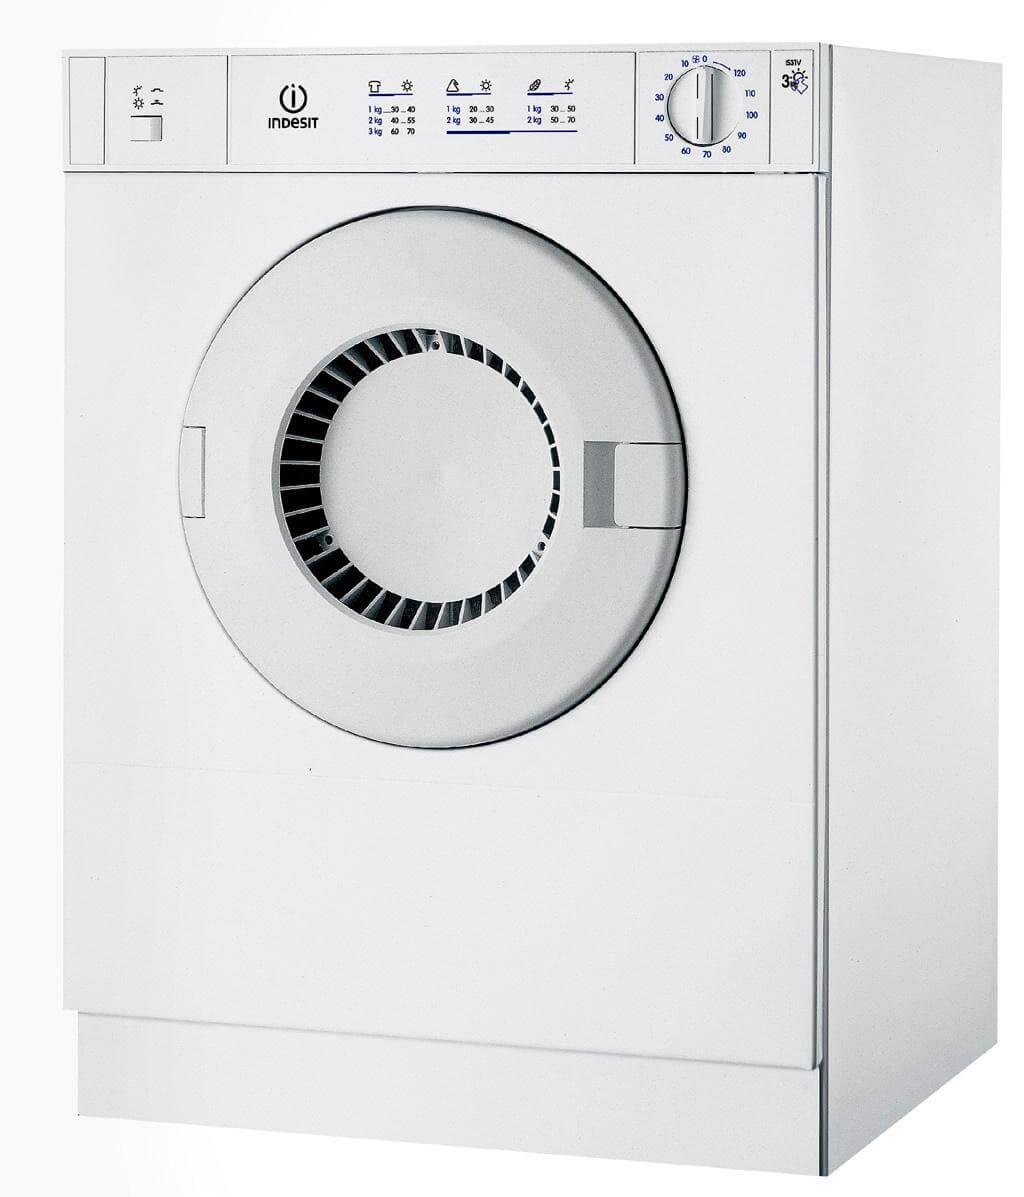 secadoras indesit